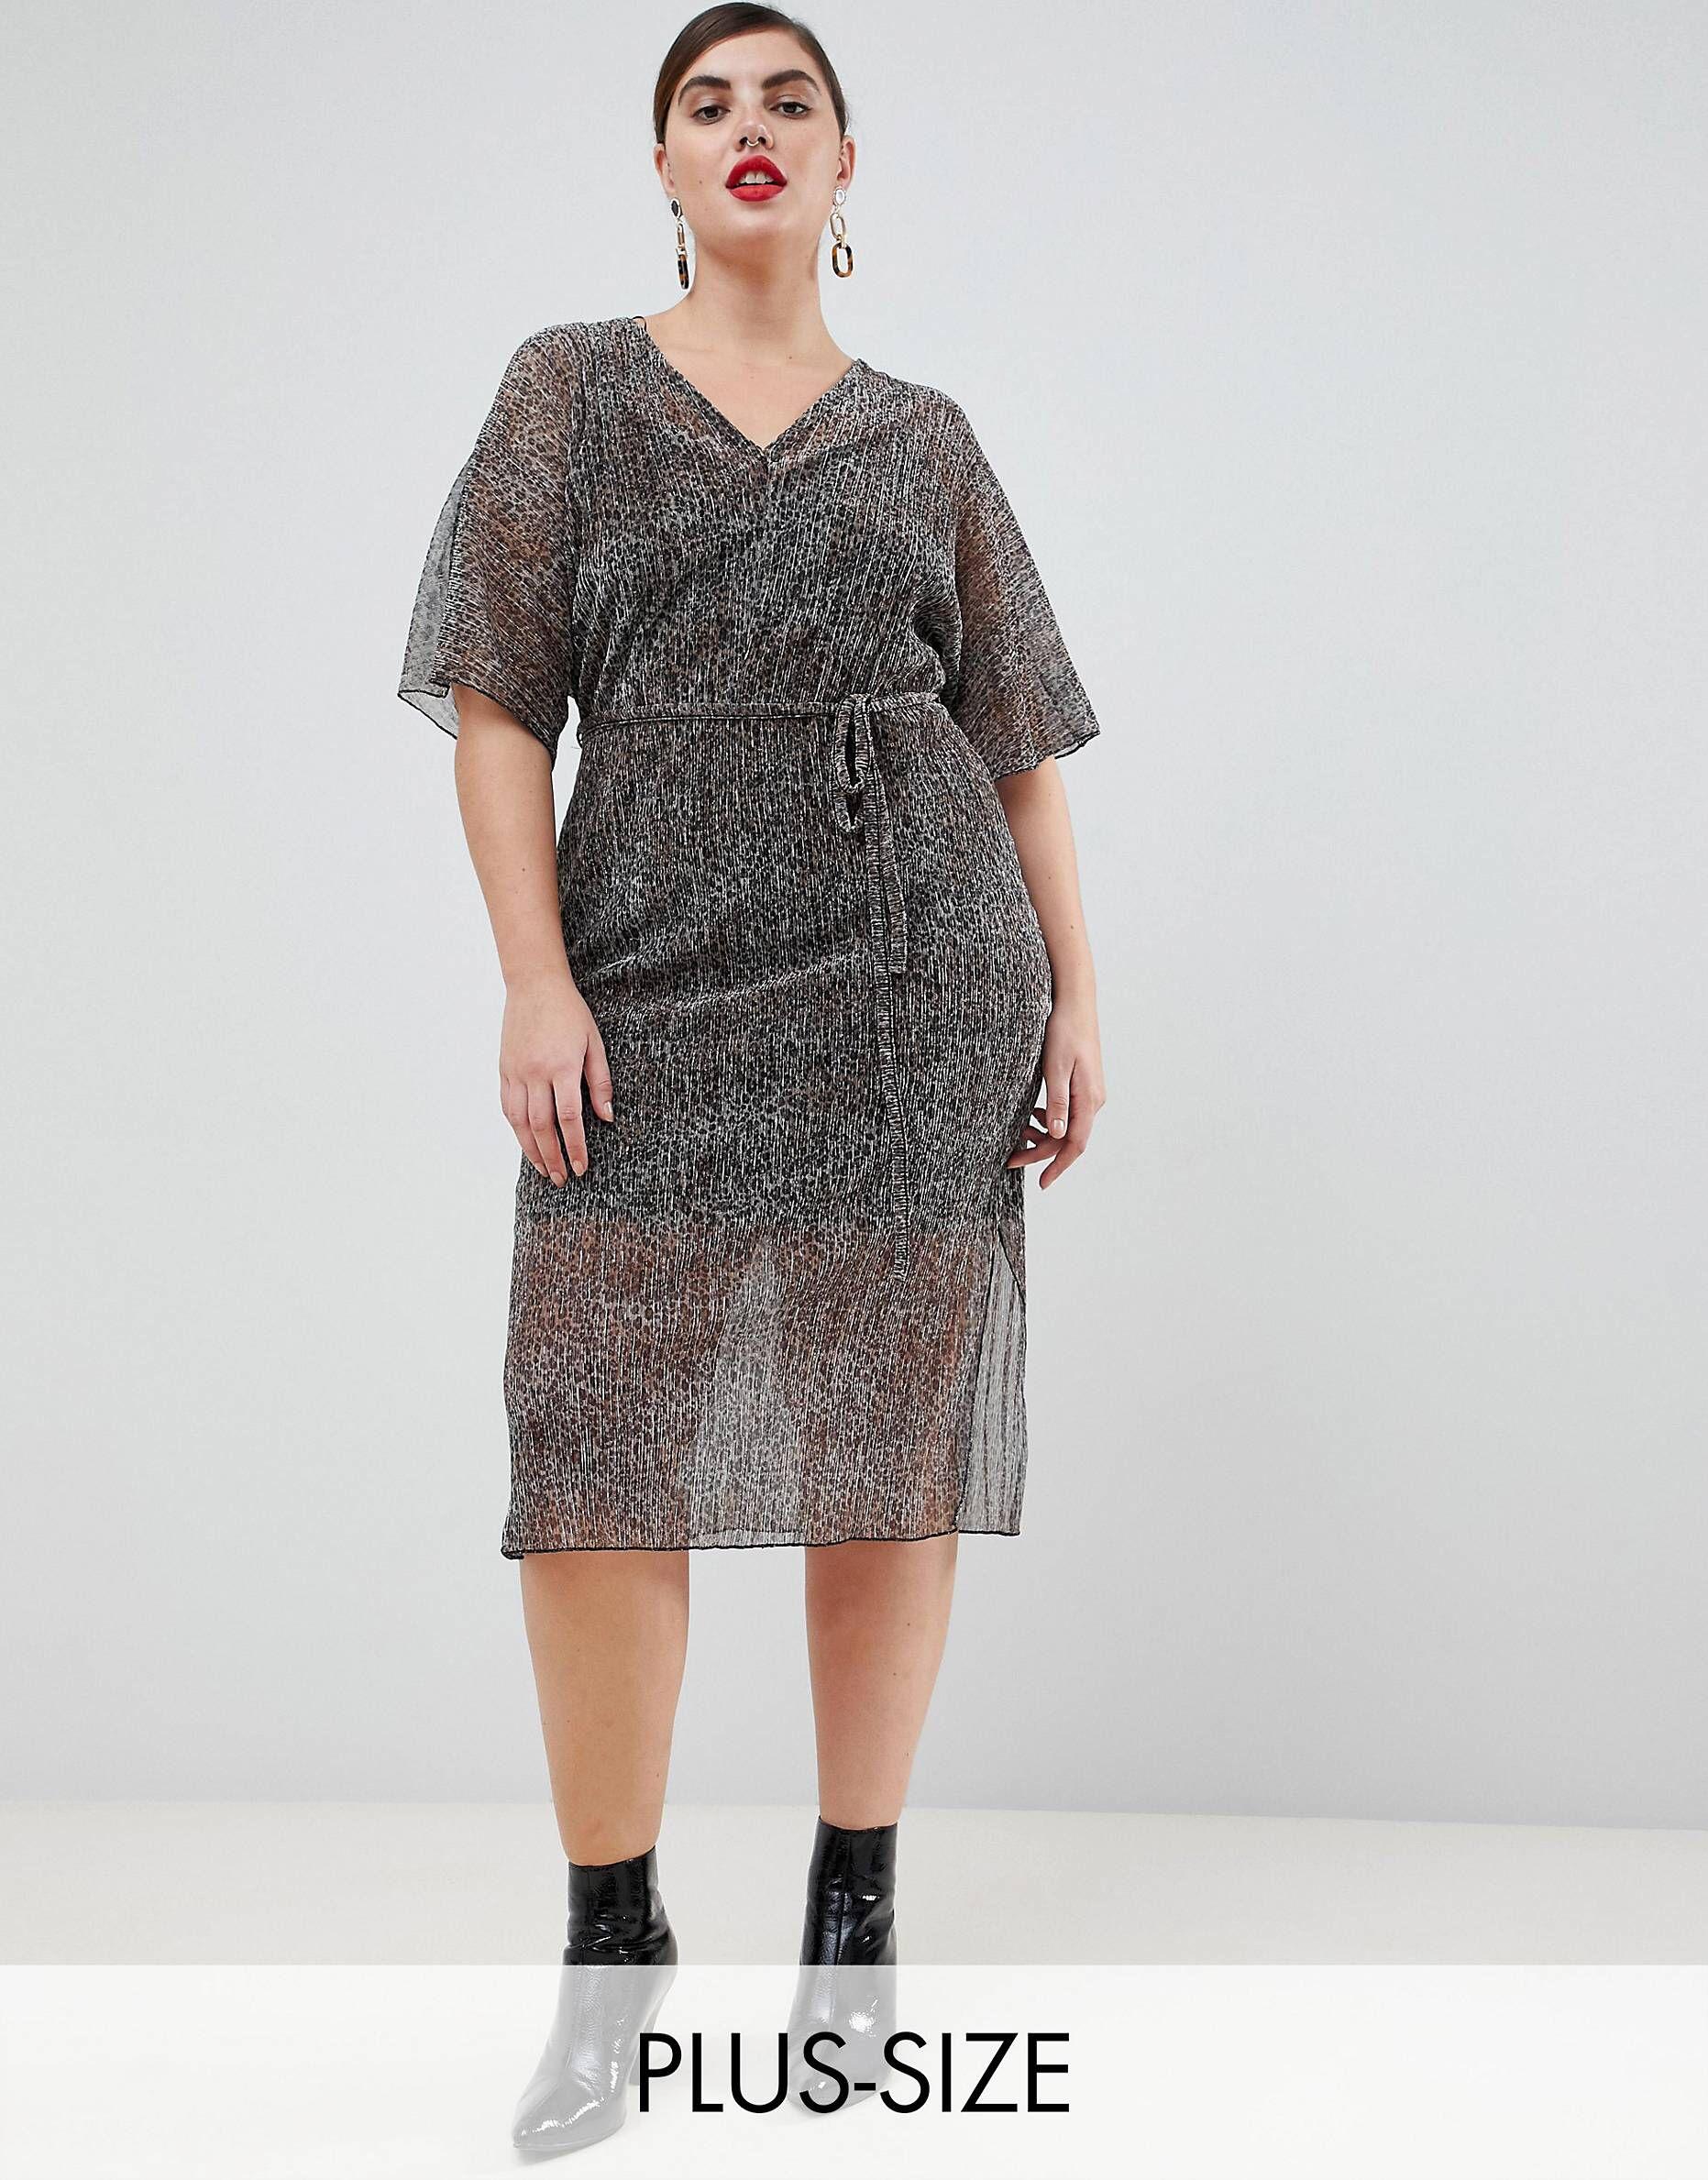 c1298e15964 River Island Plus t-shirt dress with tie waist in metallic animal ...